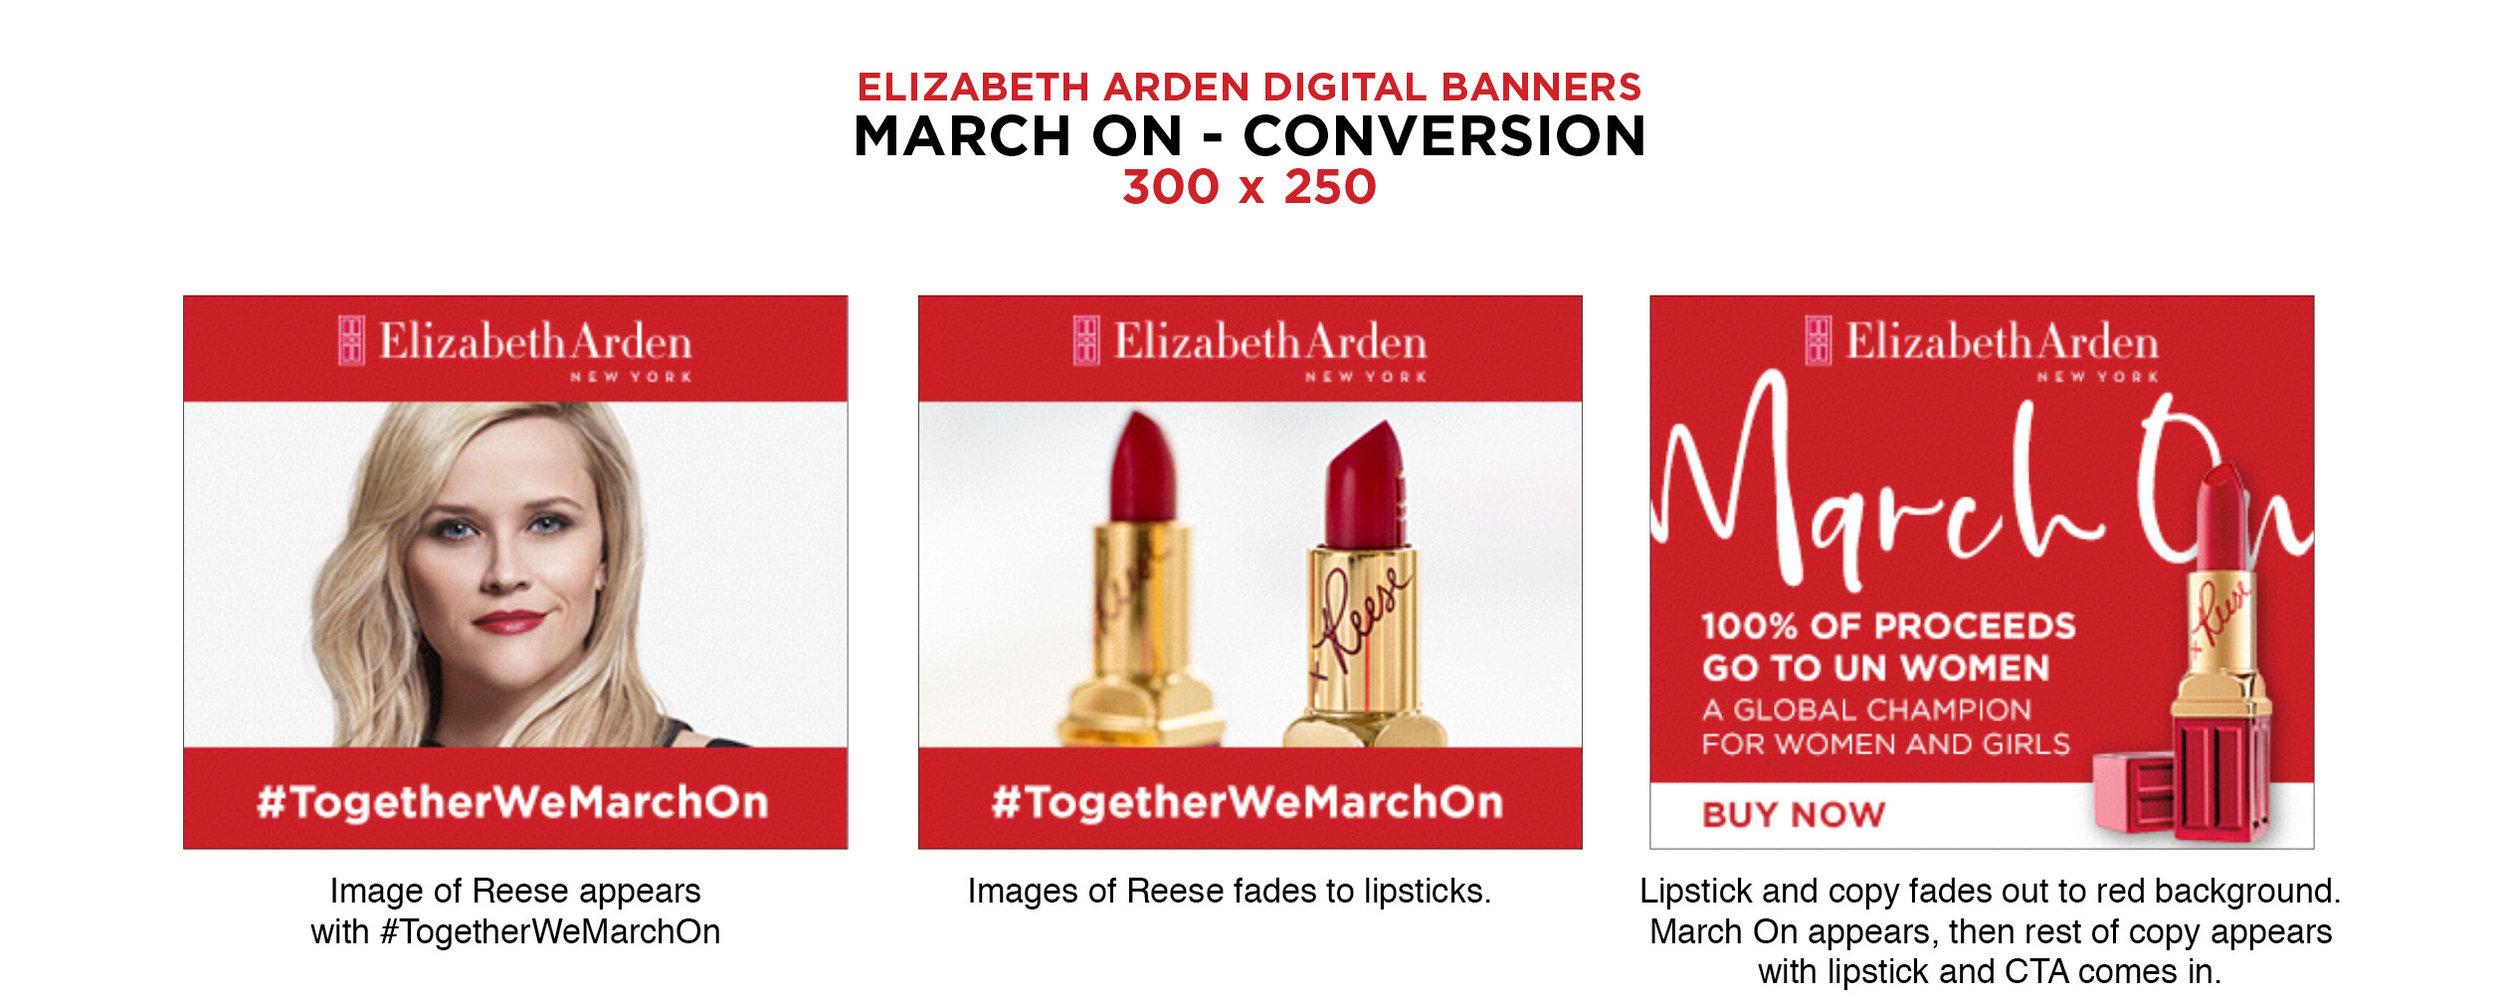 MarchOn_Conversion.jpg